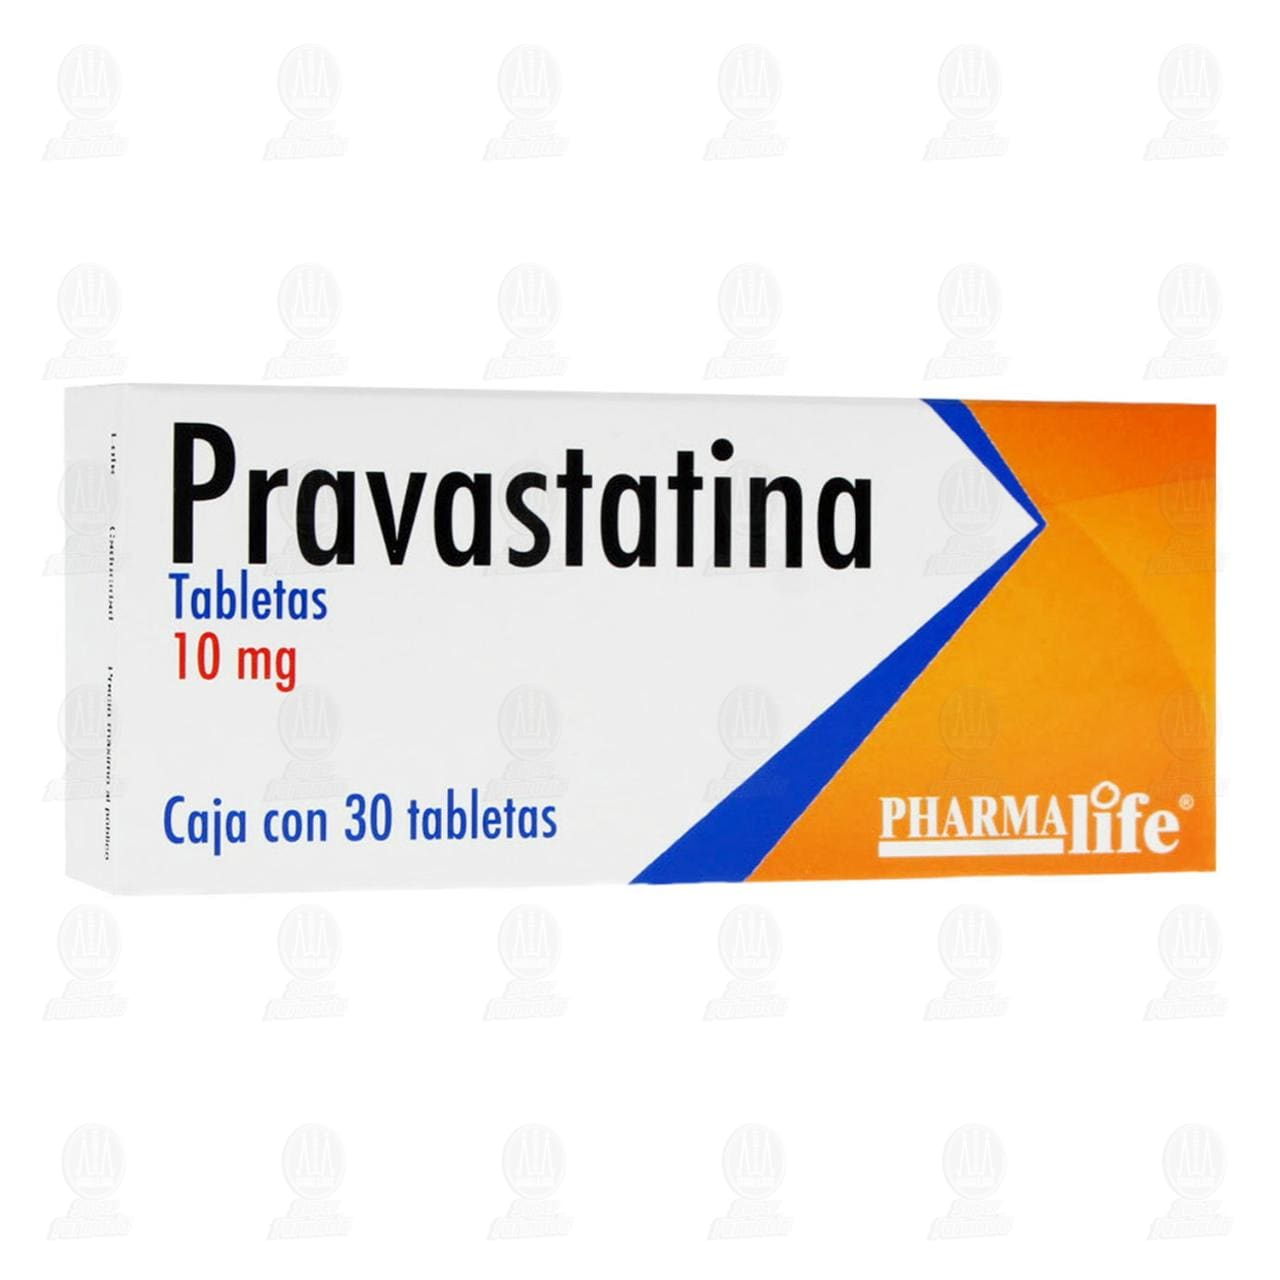 Comprar Pravastatina 10mg 30 Tabletas Pharmalife en Farmacias Guadalajara